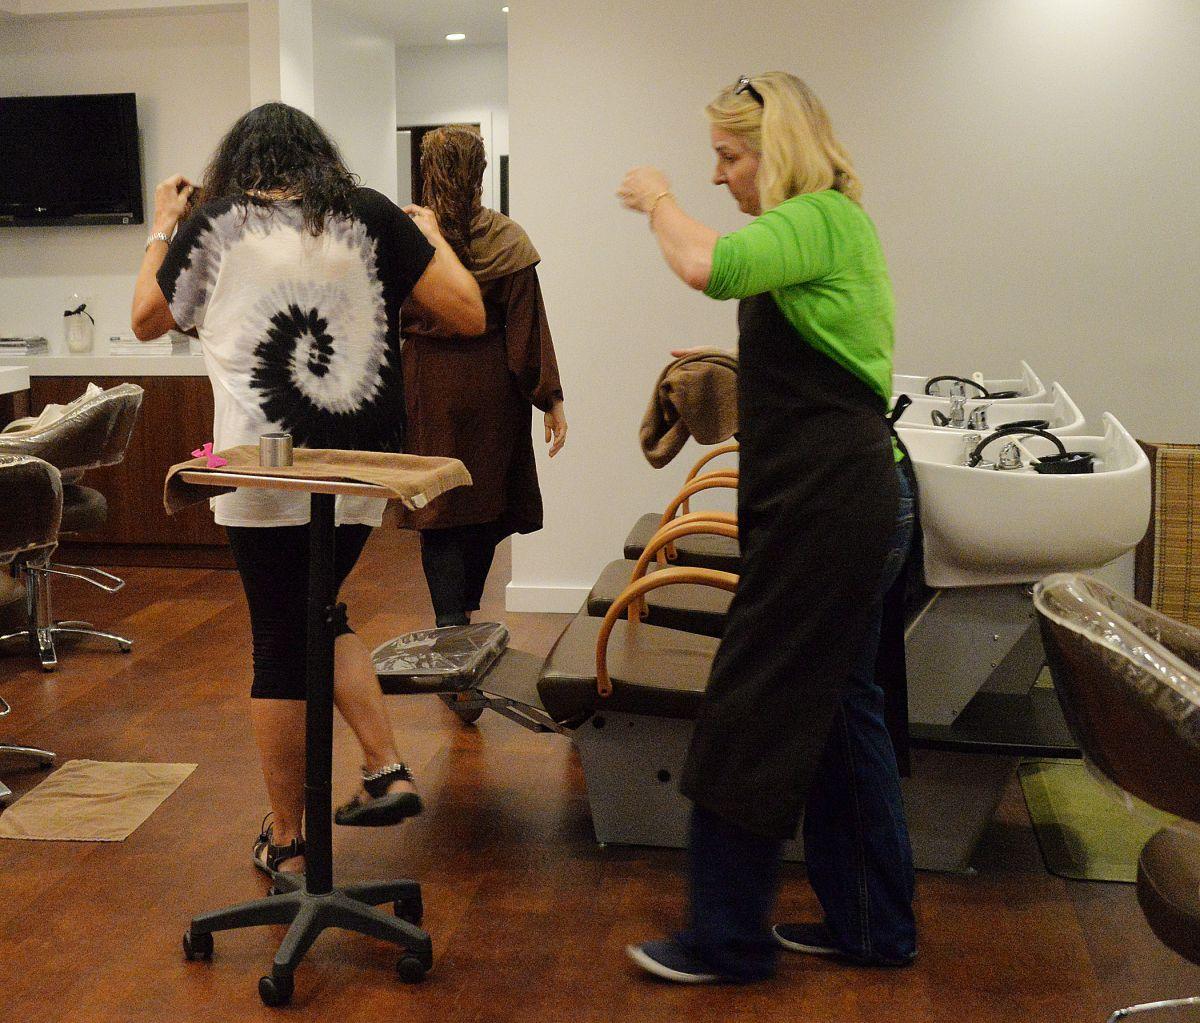 Hair Salon Los Angeles: AMY ADAMS Leaves A Hair Salon In Los Angeles 09/29/2015